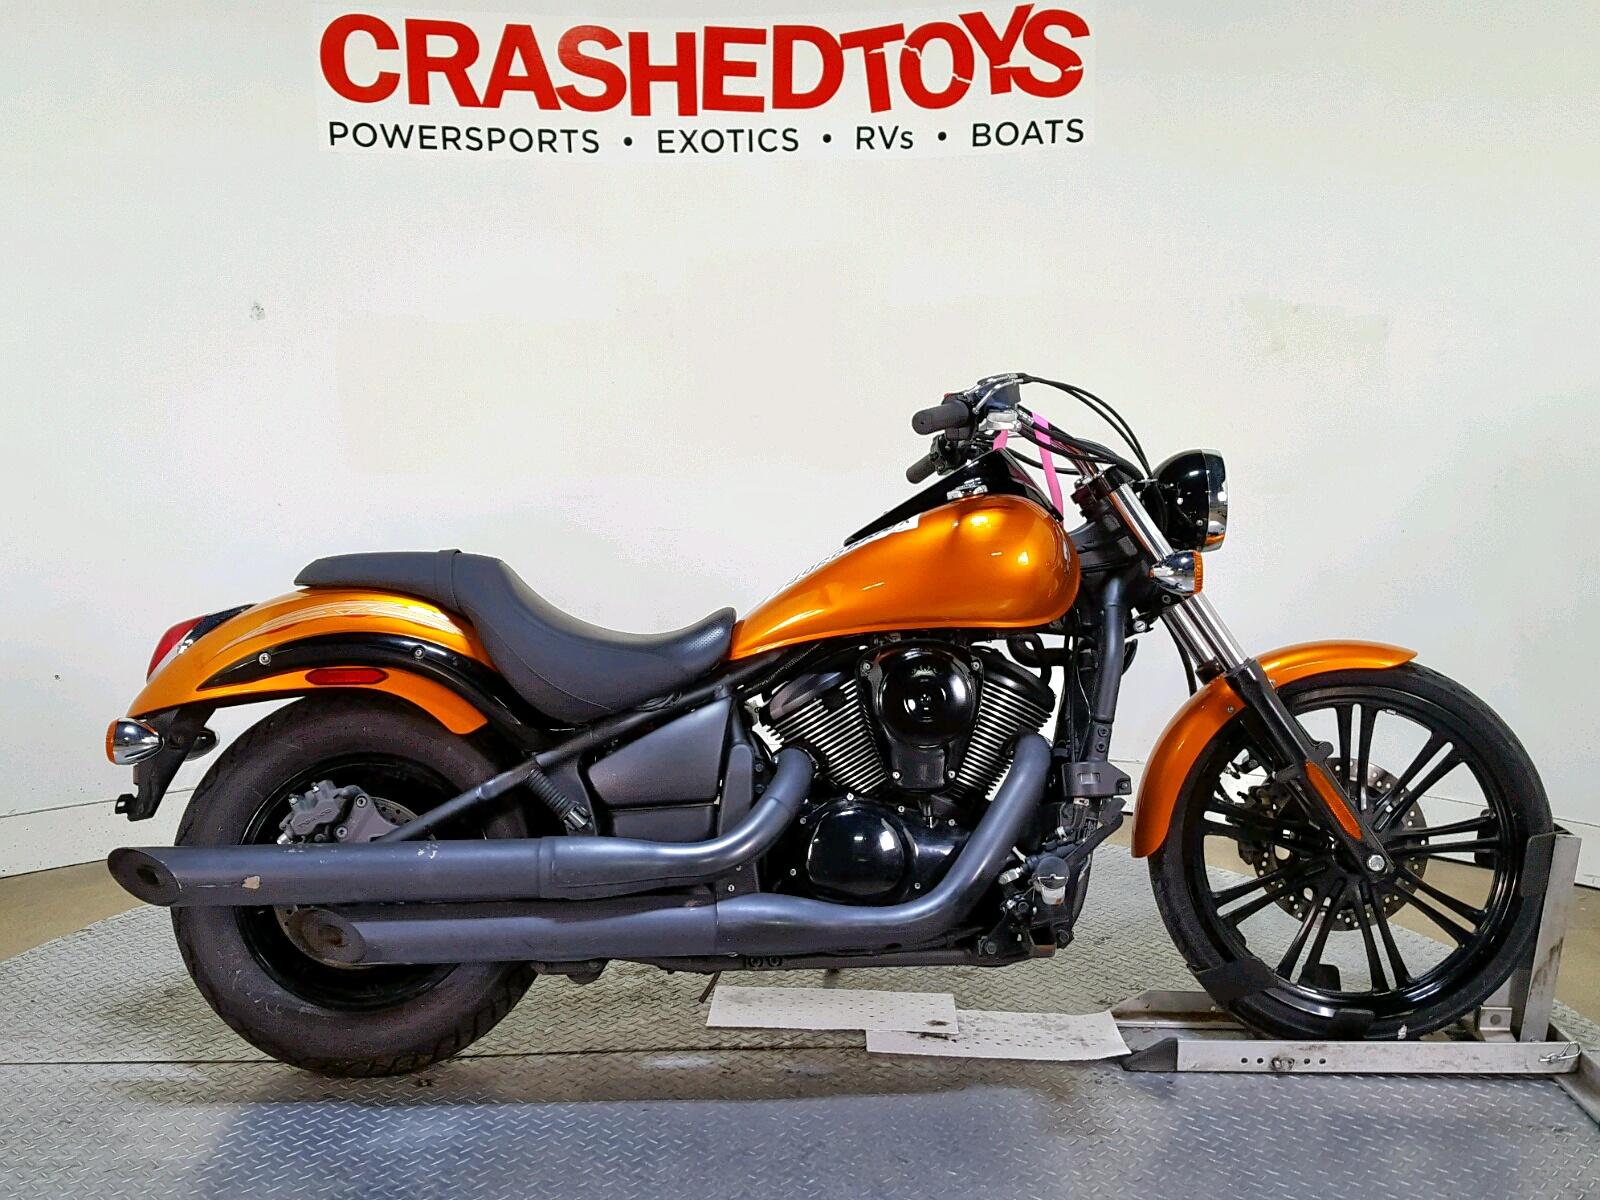 Salvage 2012 Kawasaki VN900 C for sale